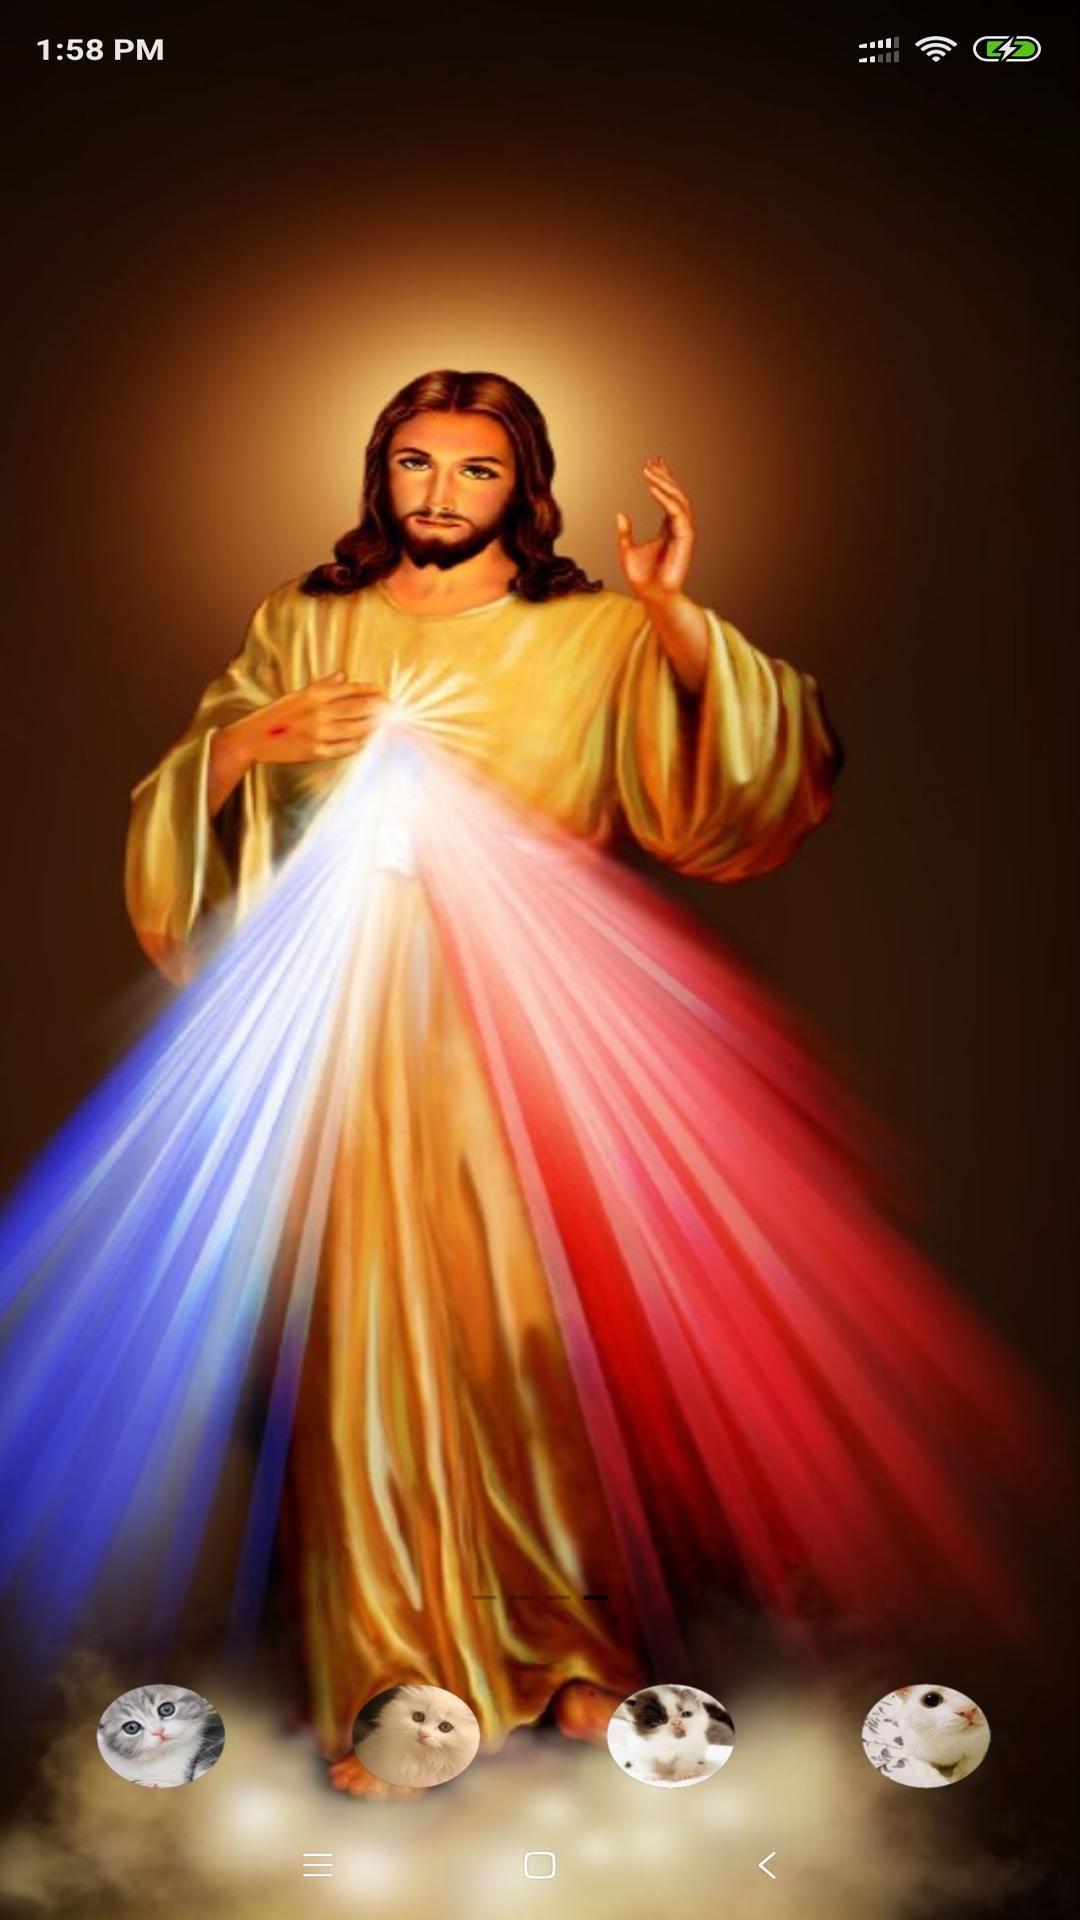 Beautiful Jesus Wallpaper Download In 2020 Jesus Wallpaper Wallpaper Downloads Free Wallpaper